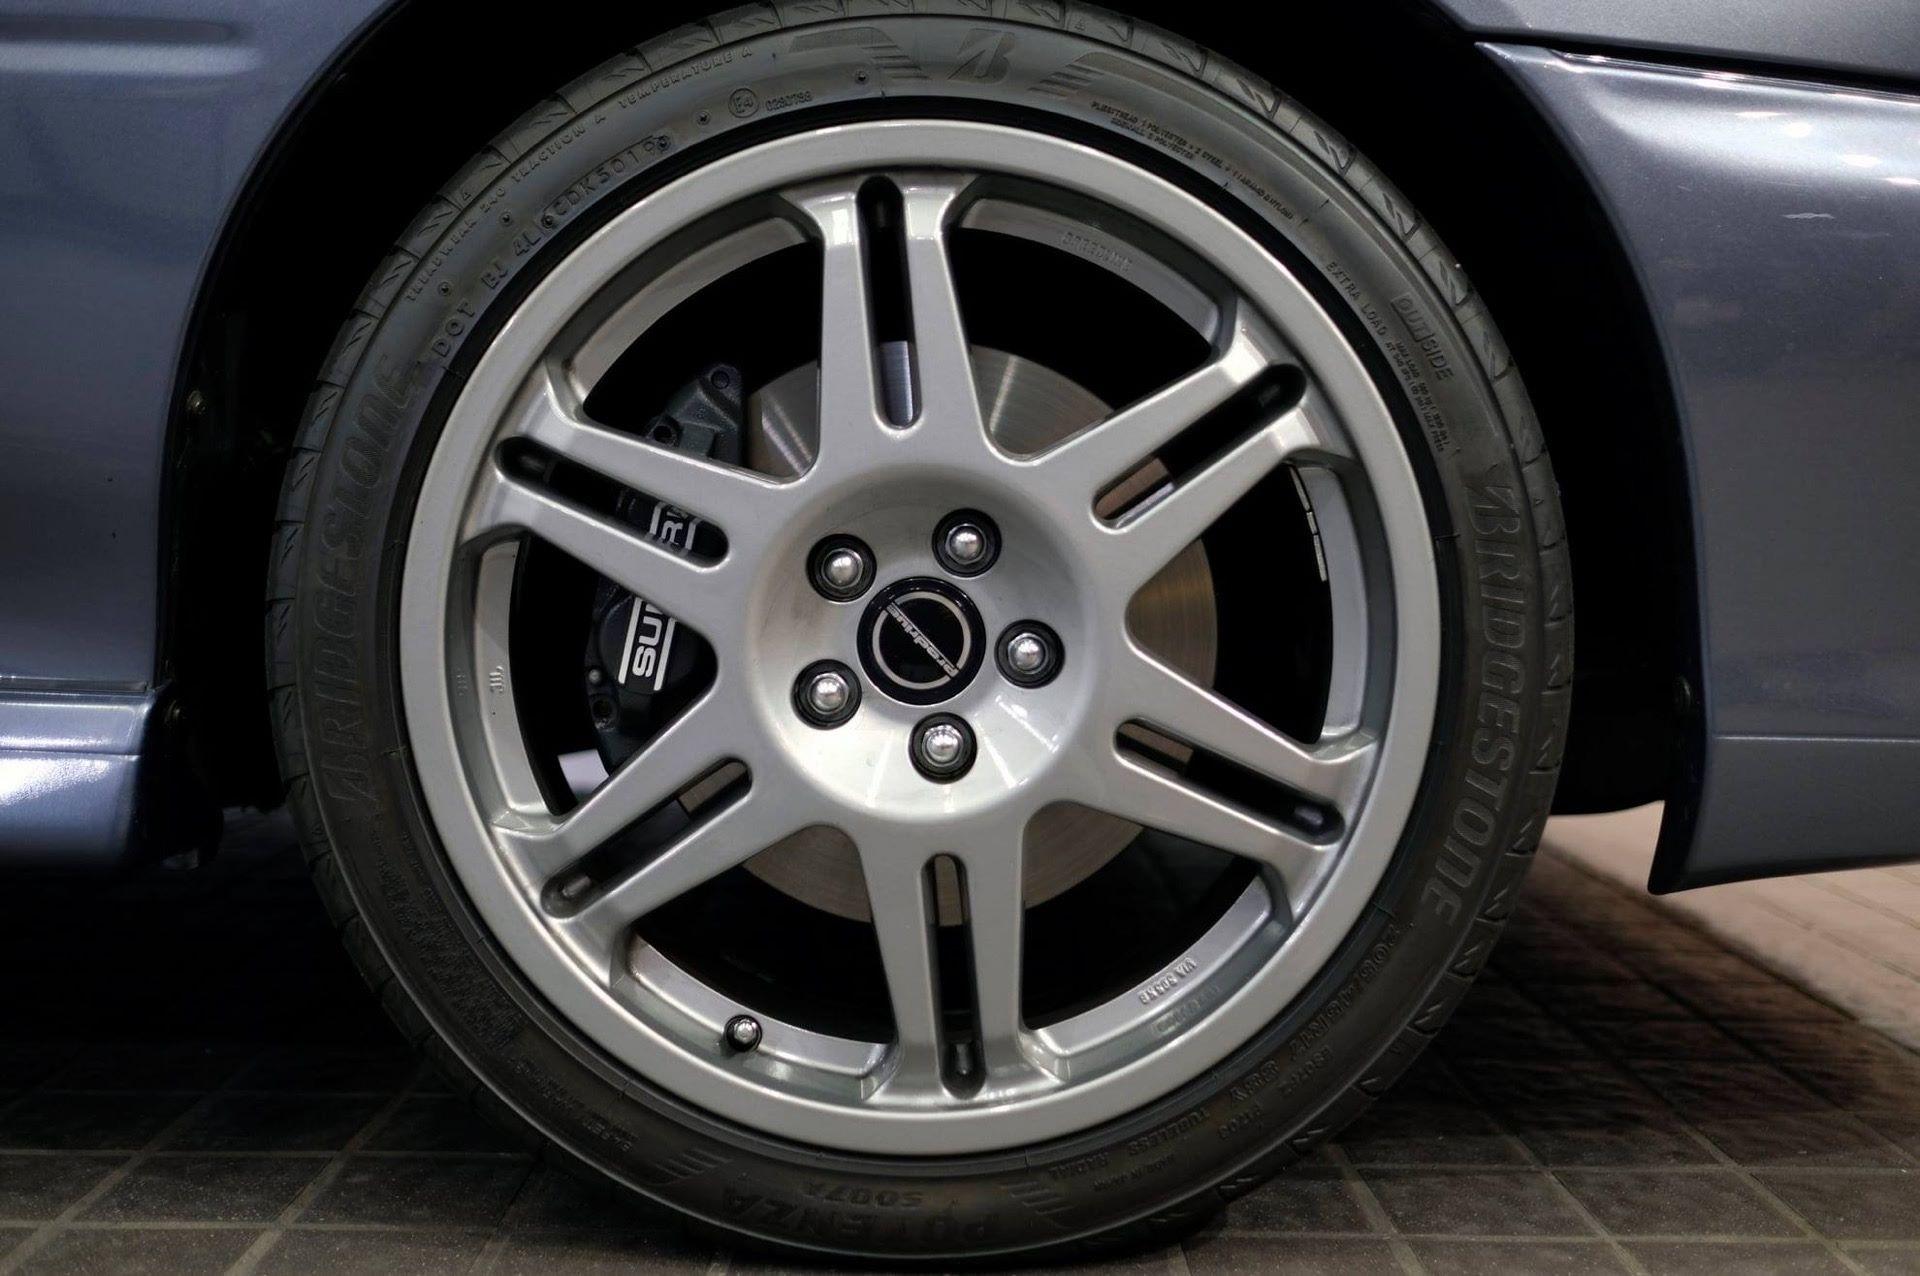 Subaru-Impreza-RB5-1999-8